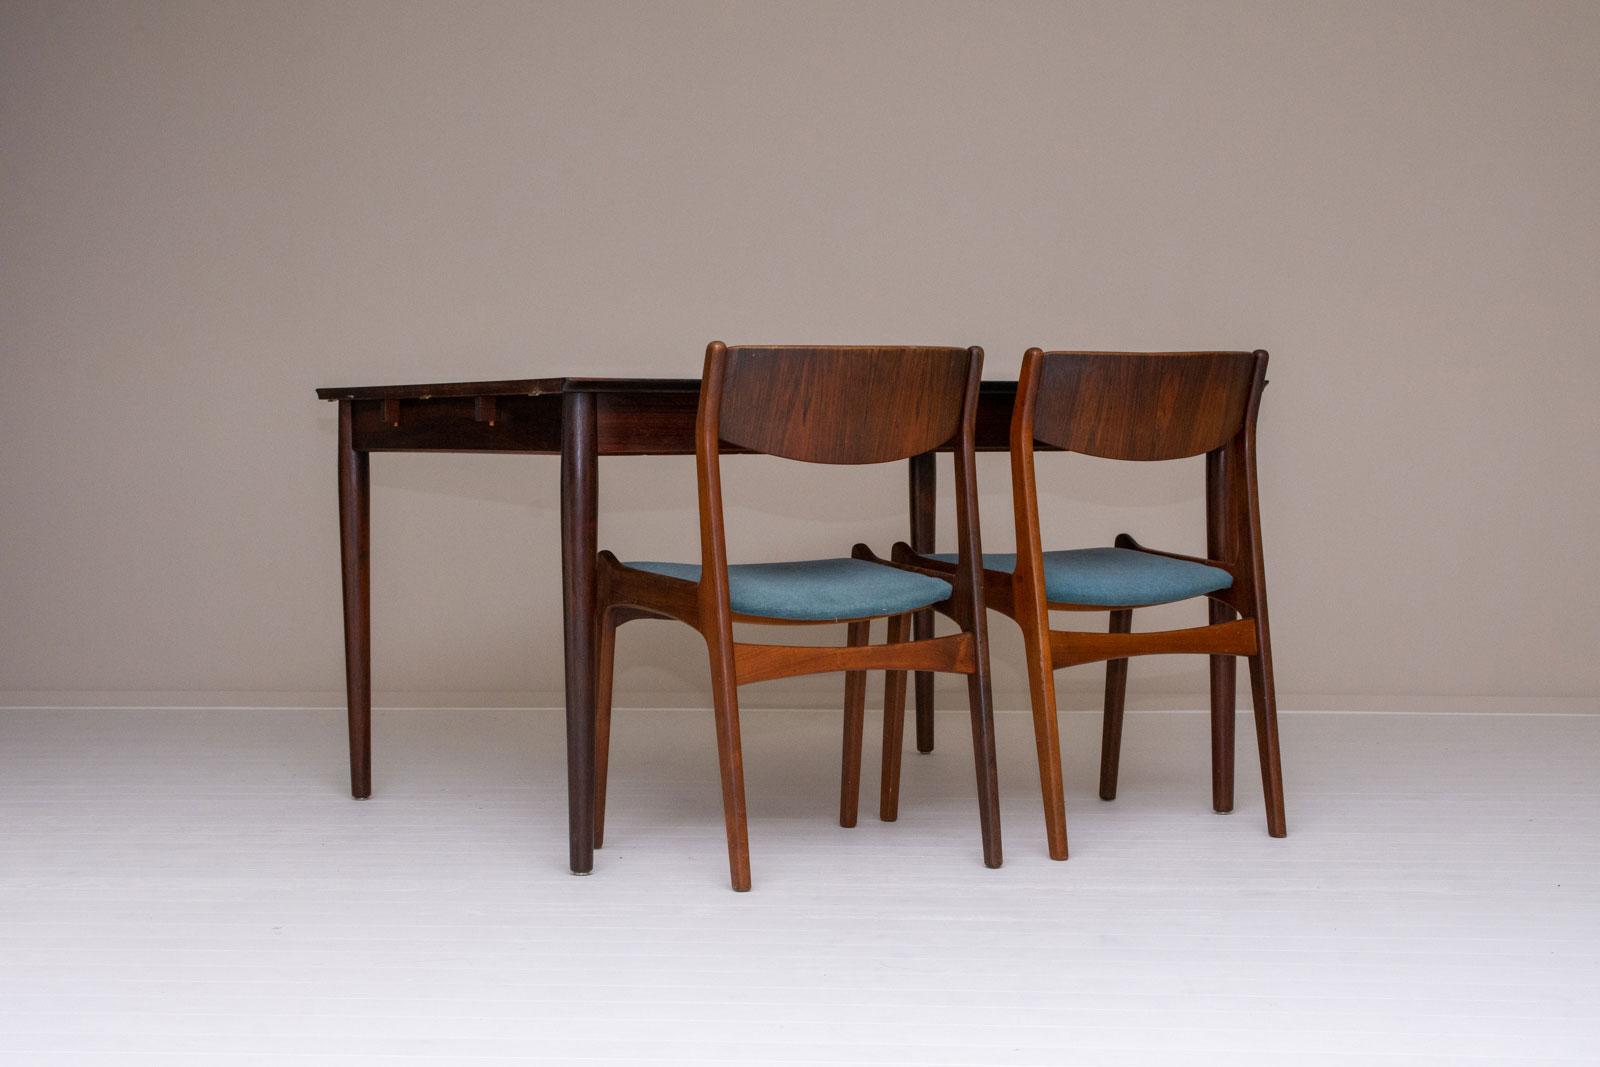 Model227 Dining Table by Arne Vodder